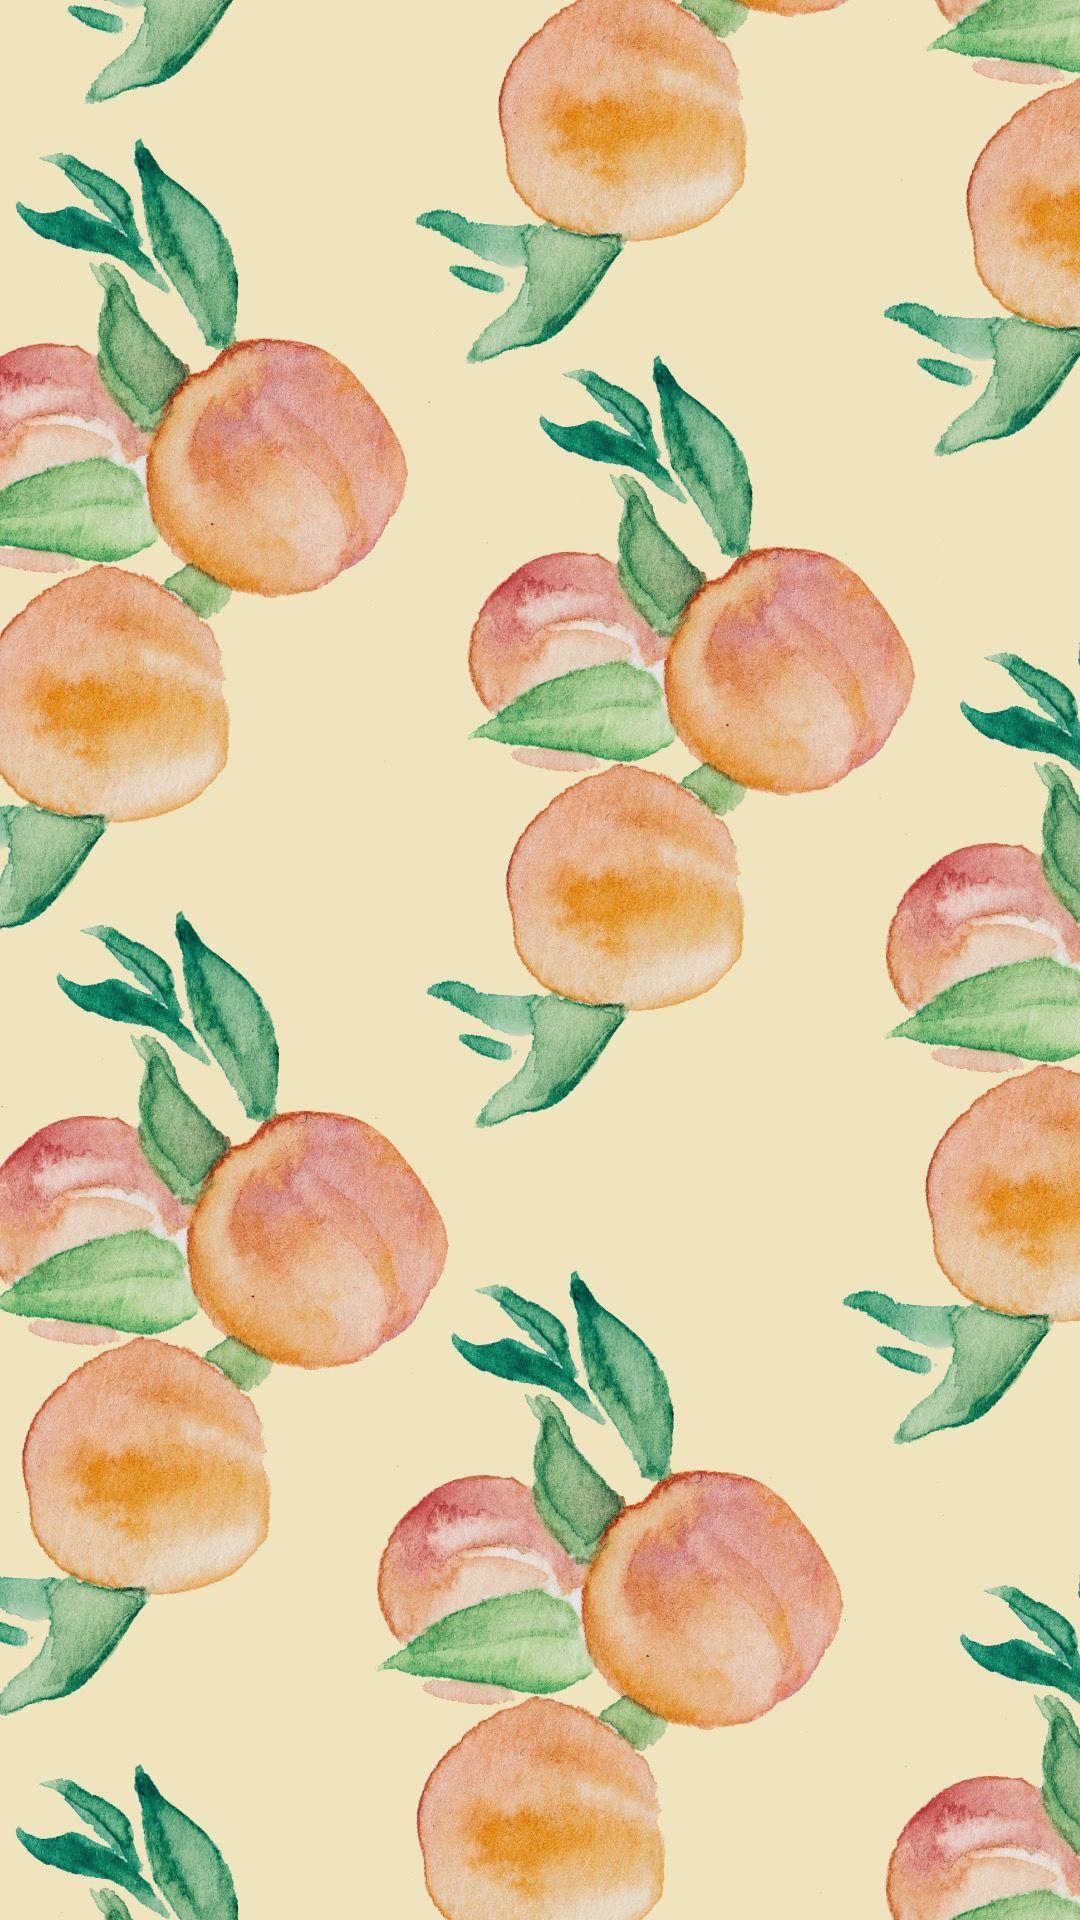 [Freebie] Watercolor Wednesday Phone Wallpapers Peachy